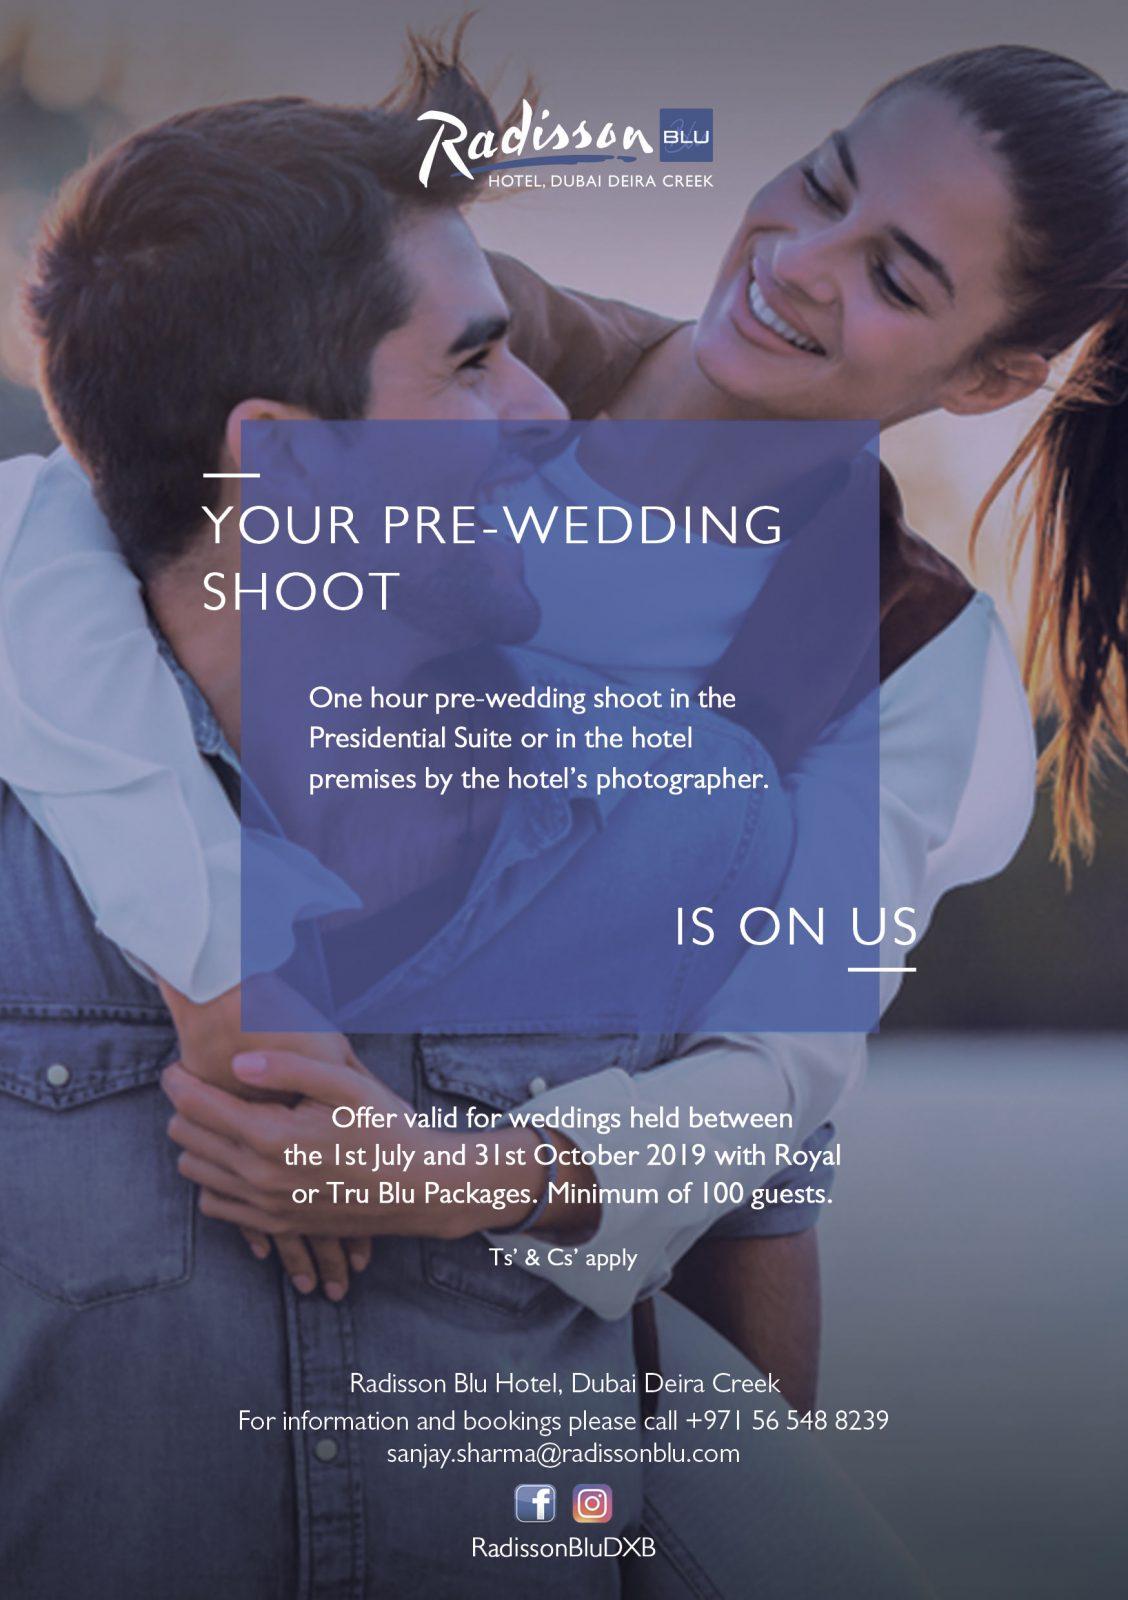 Radisson Blu Deira Creek Pre-Wedding Shoot